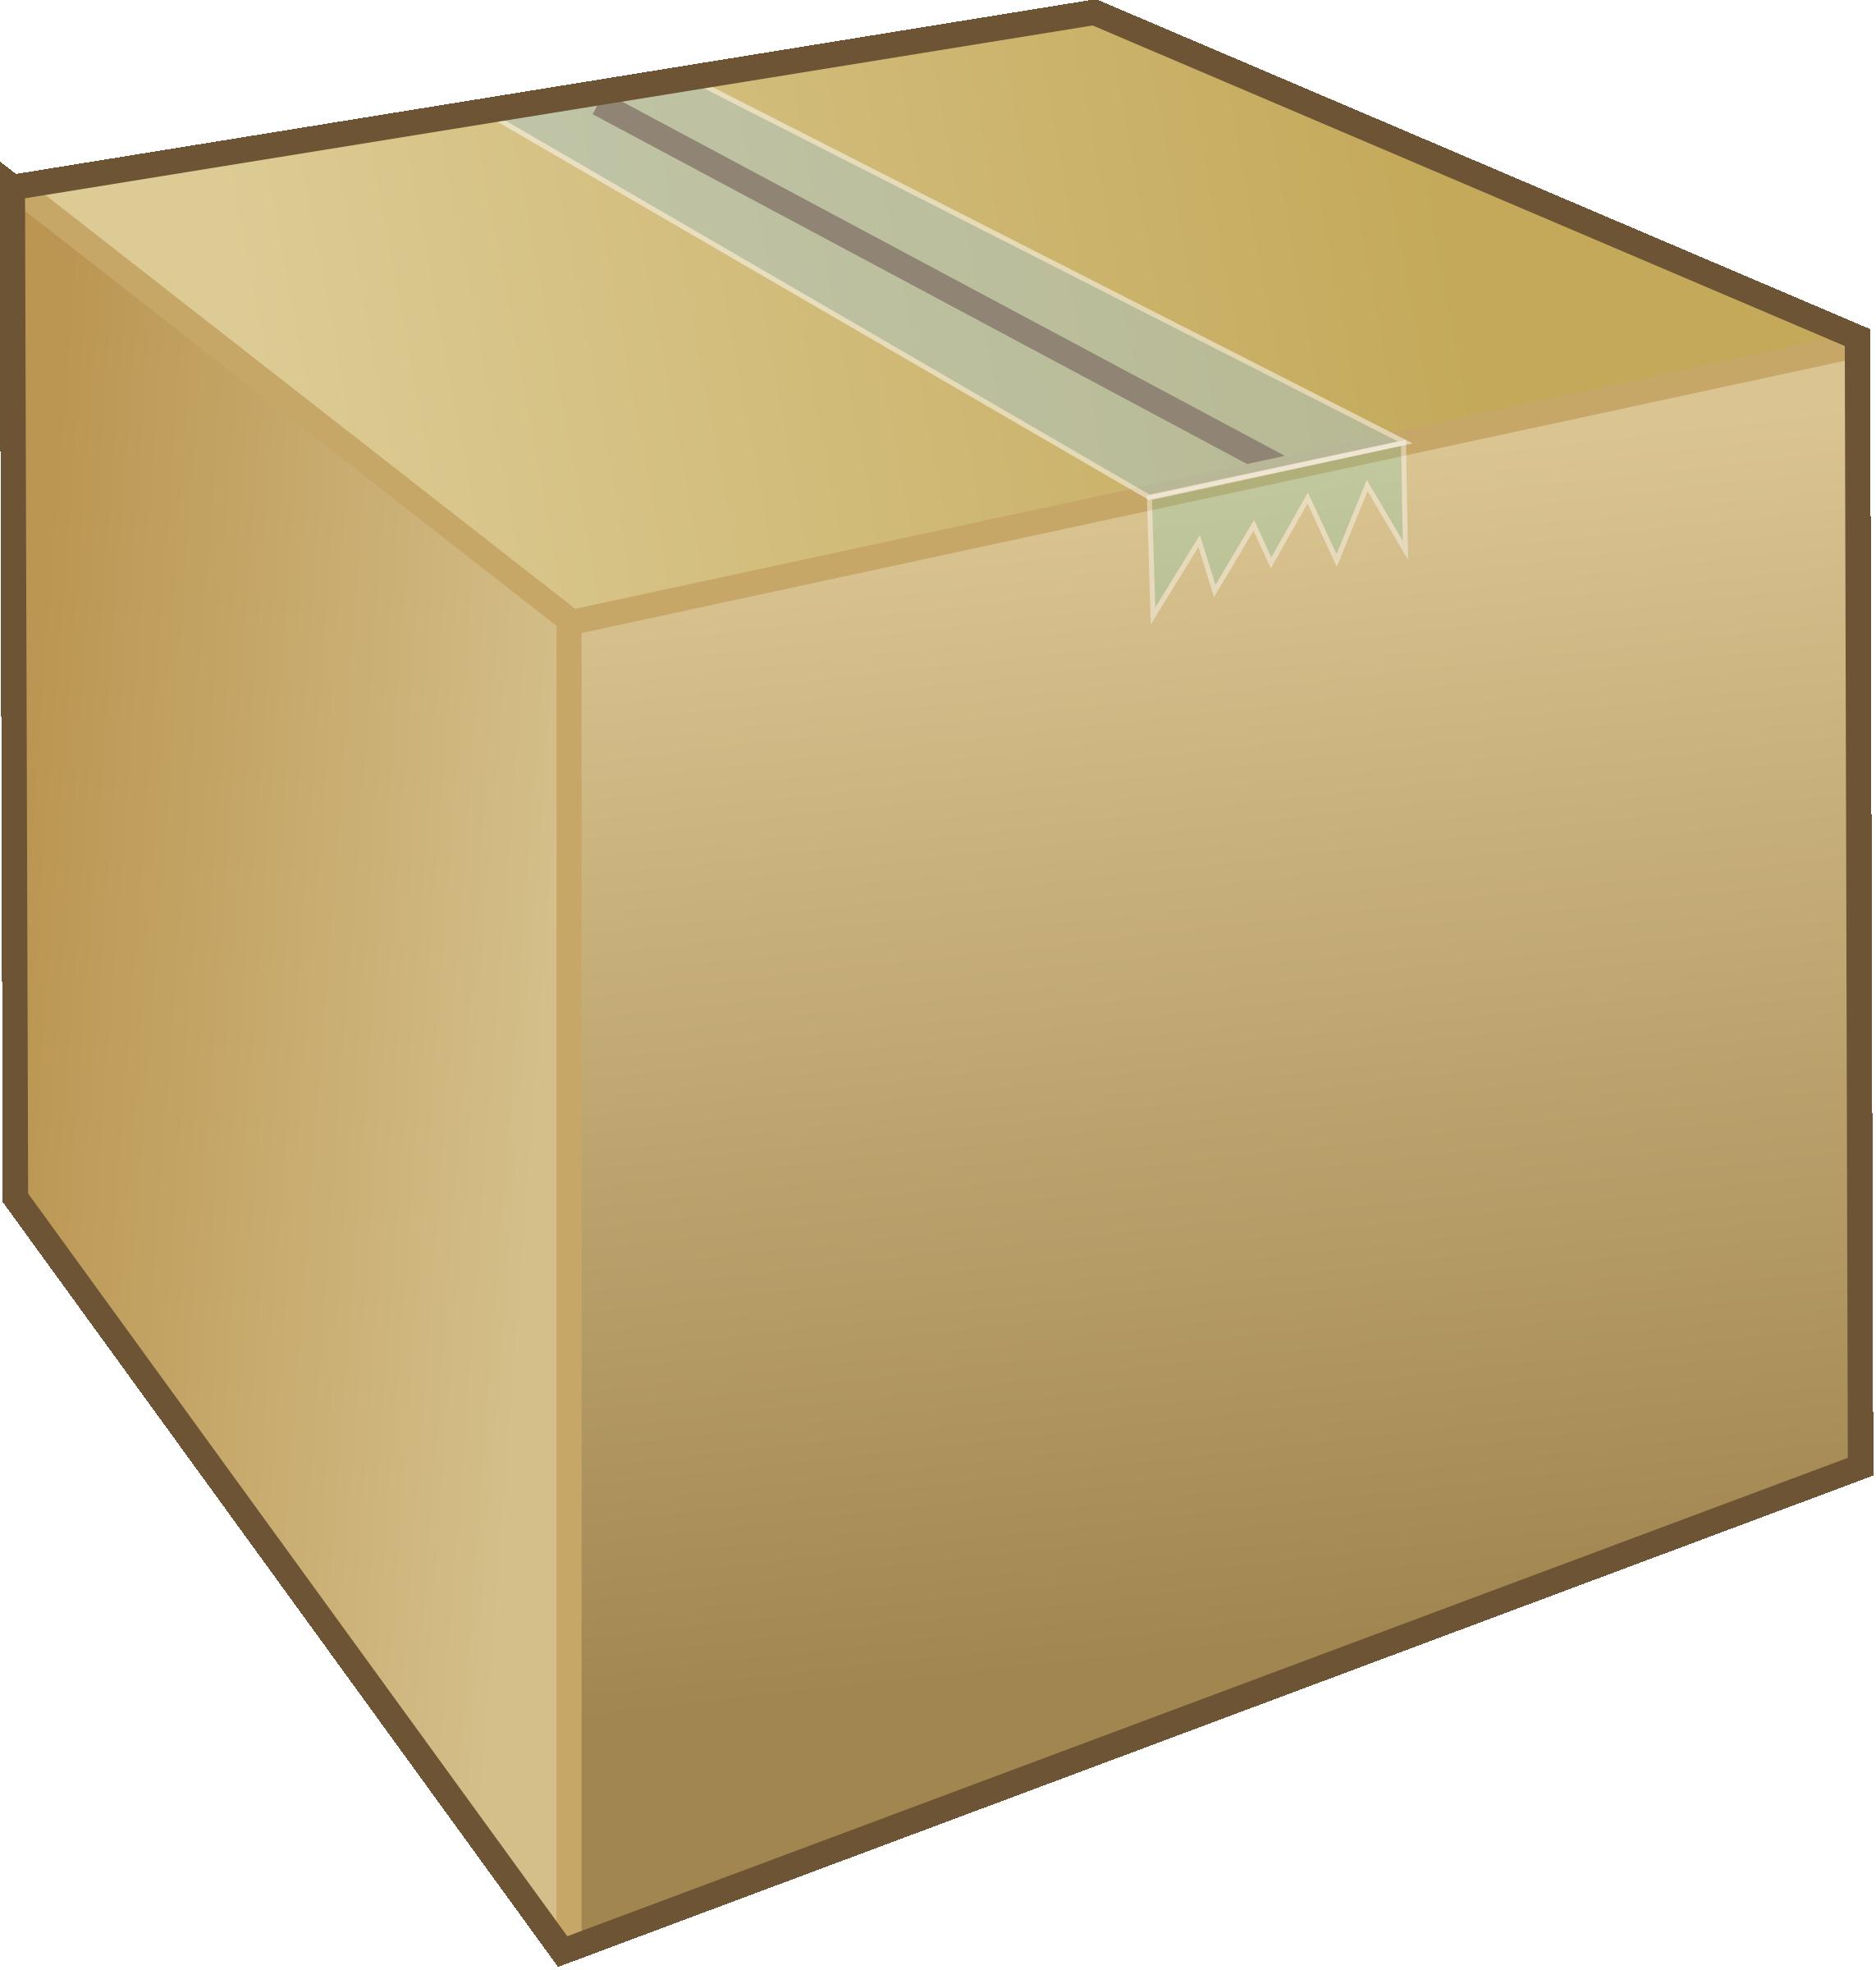 Parcel clipart closed box Clipart Images Clipart Free Box